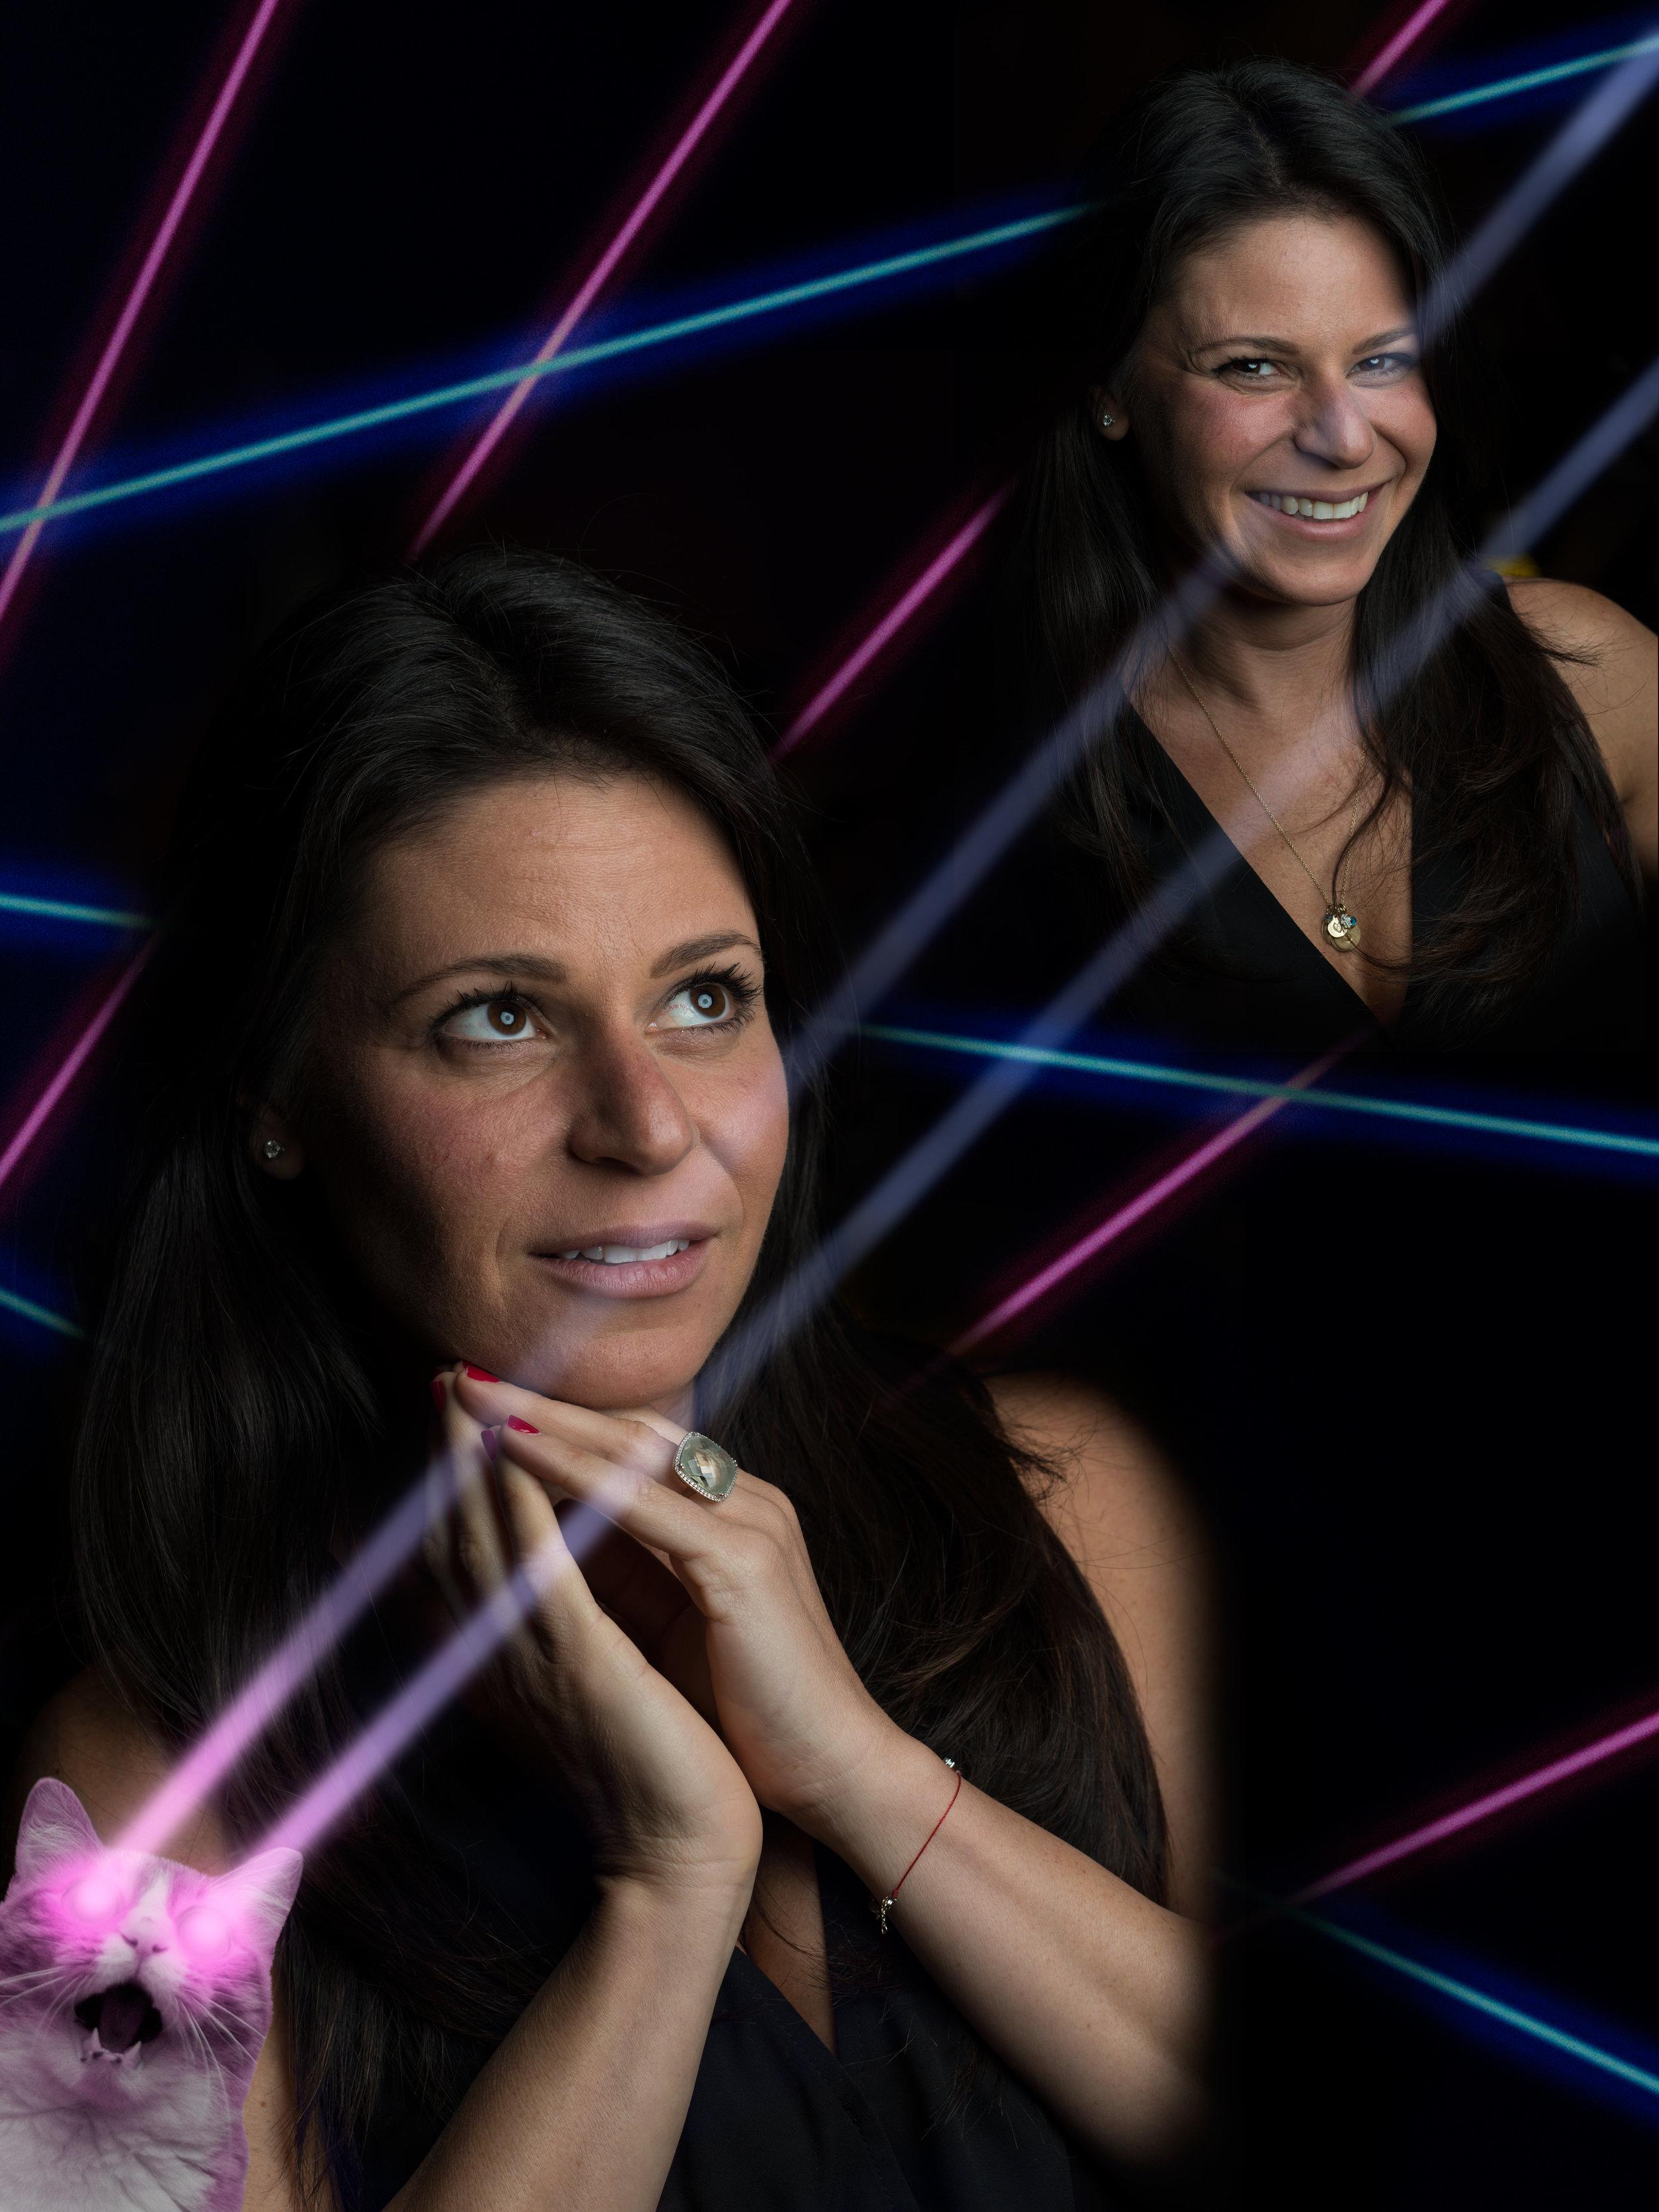 Jennifer Rozenbaum